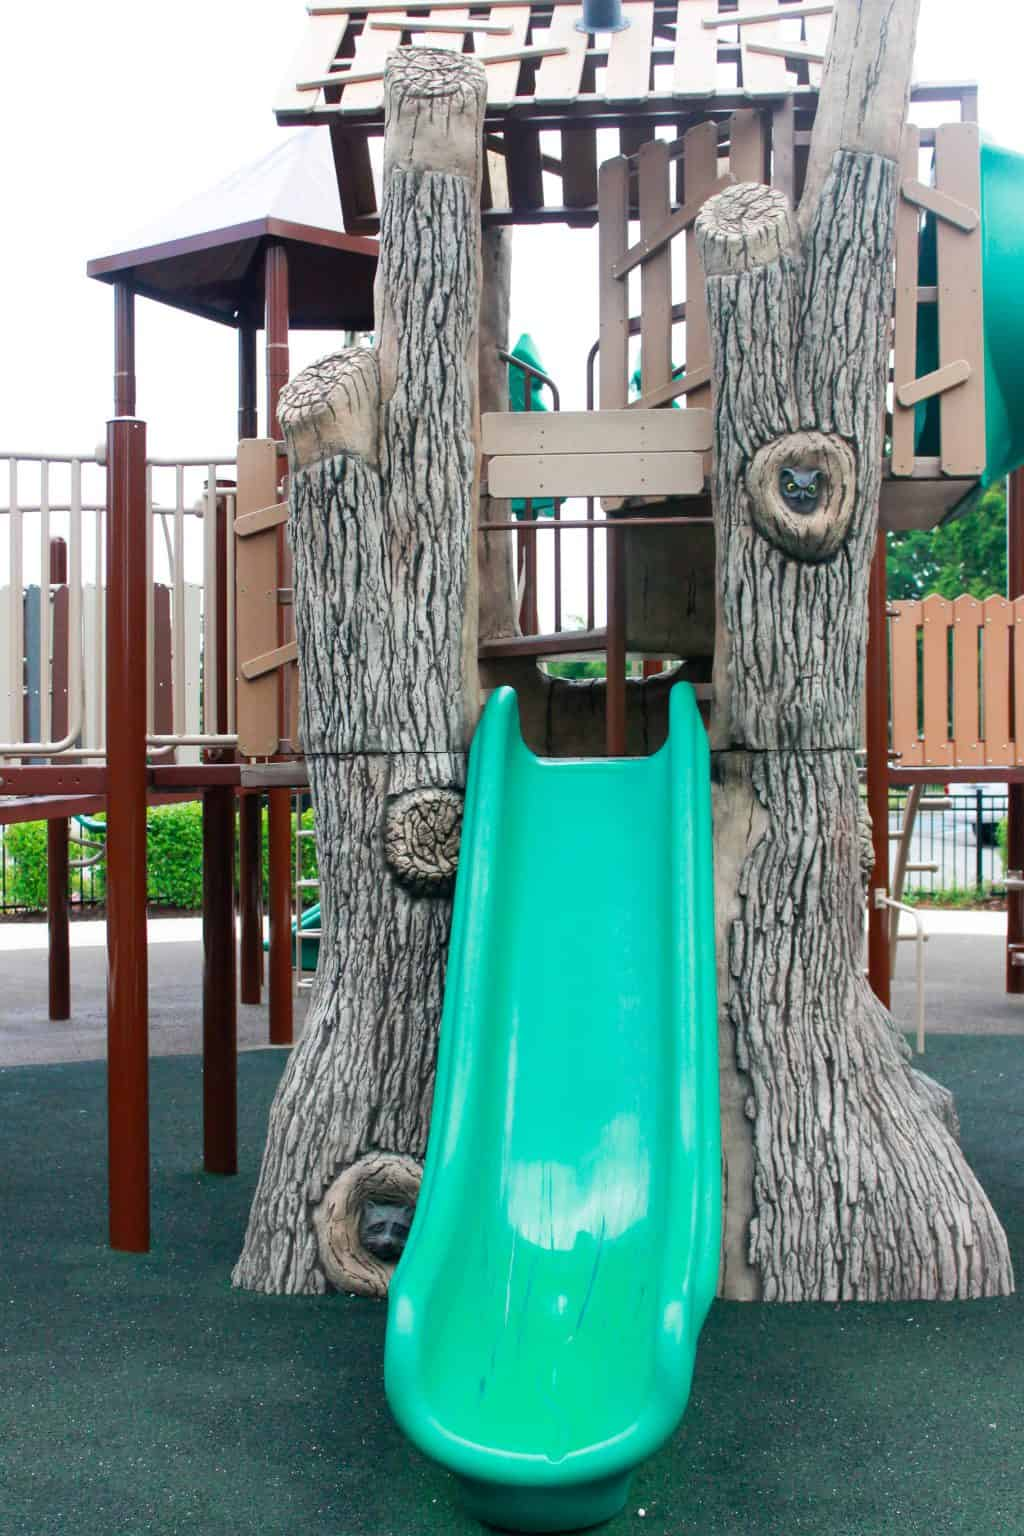 windward-beach-park-playground-brick-nj_28266703285_o-1024x1536